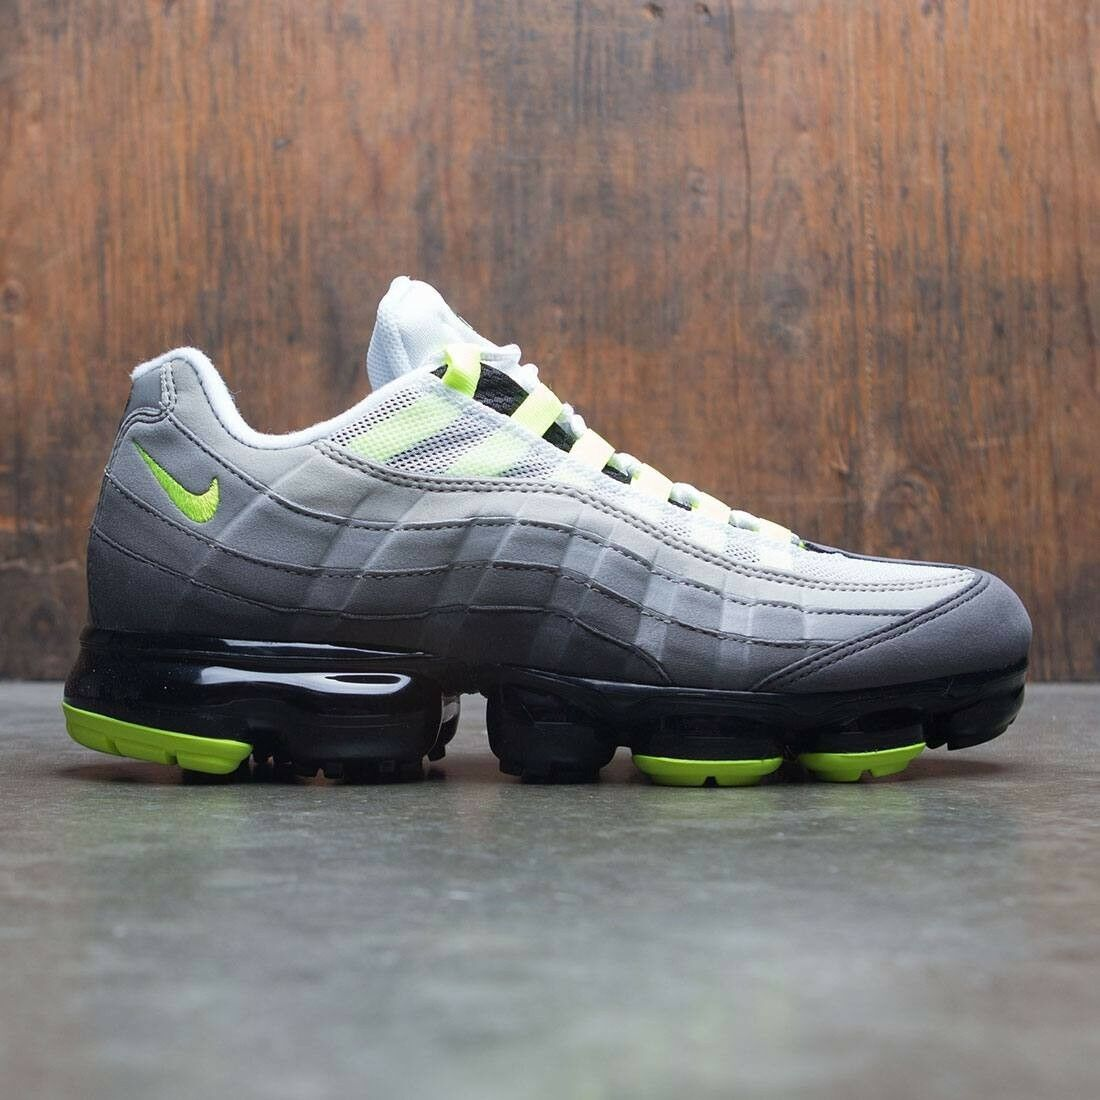 hot sale online f90f4 63b0a Nike air max 95 og neon neon neon vapormax misura 8,5.aj7292-